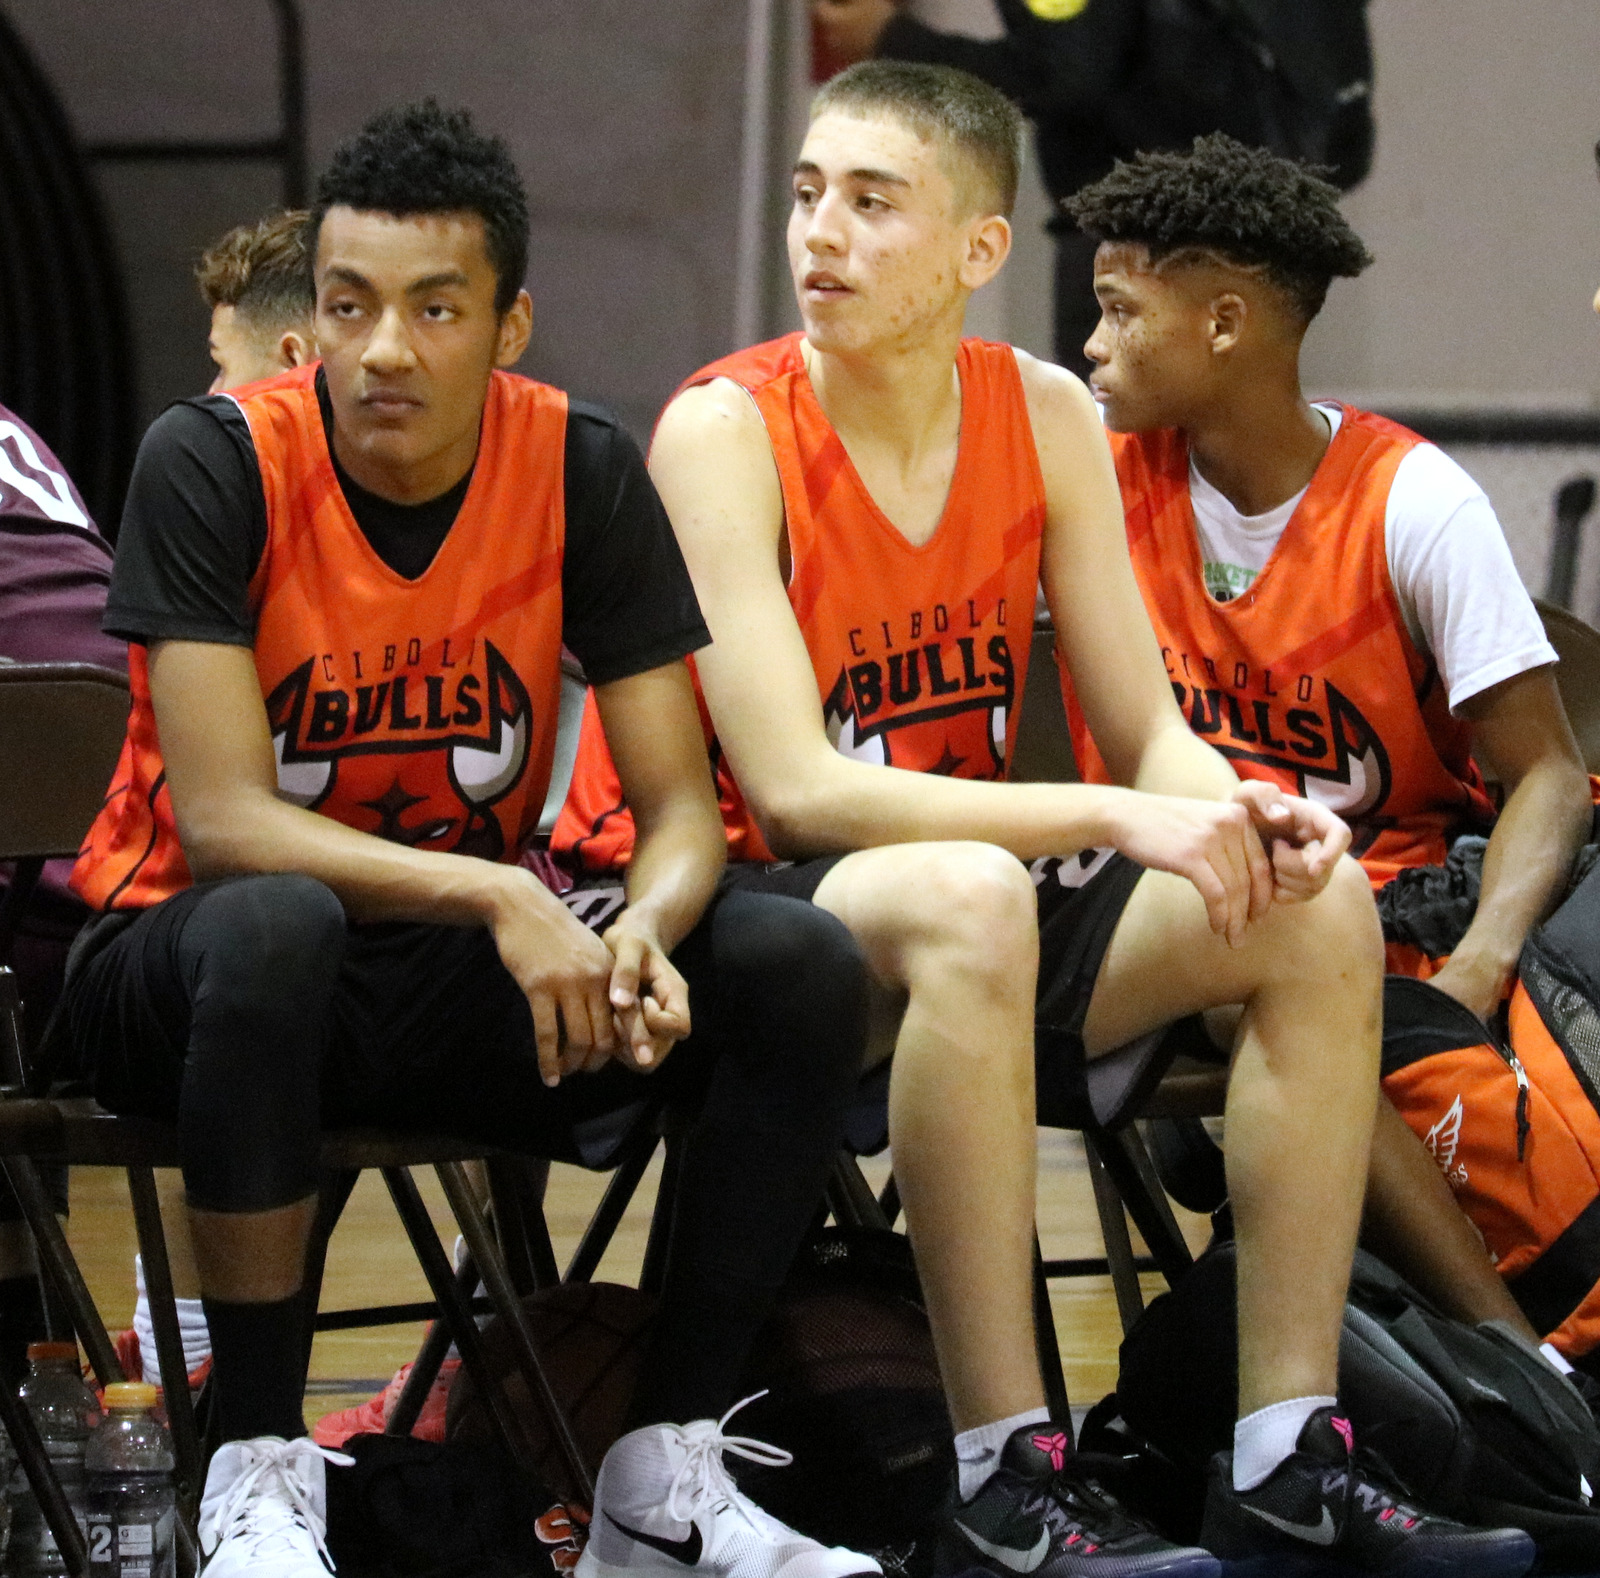 Mason and Gus Basketball